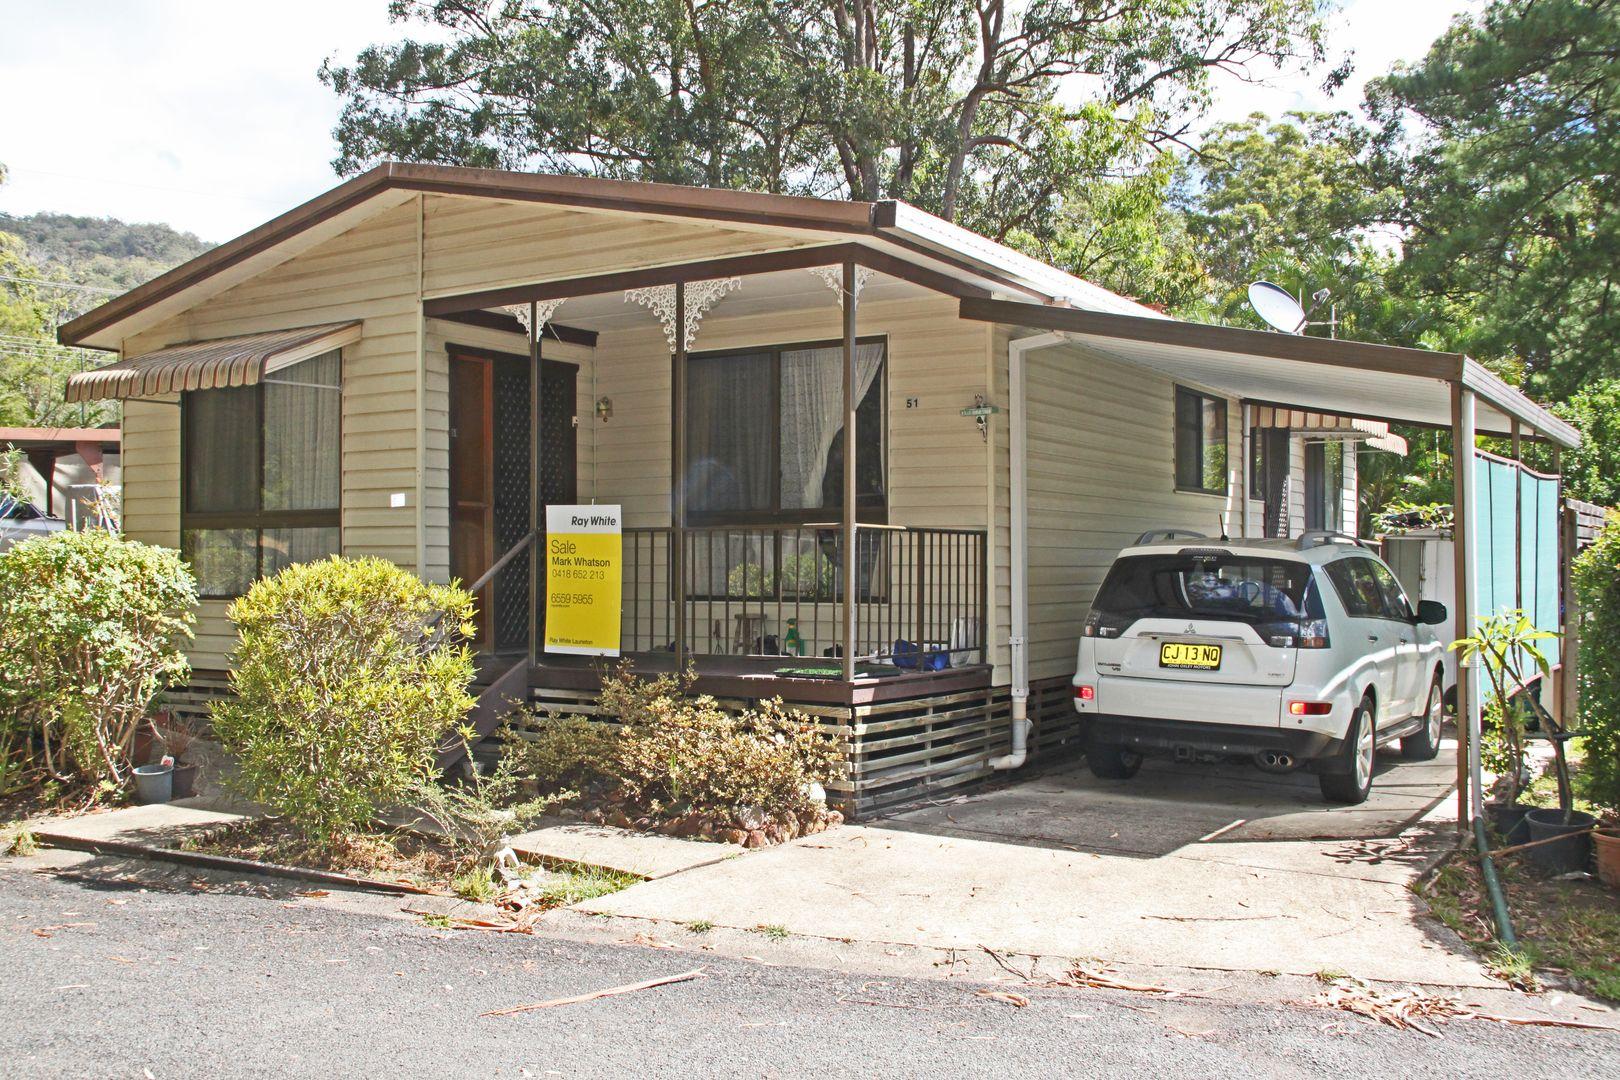 51/229 Ocean Drive, Lakewood NSW 2443, Image 0